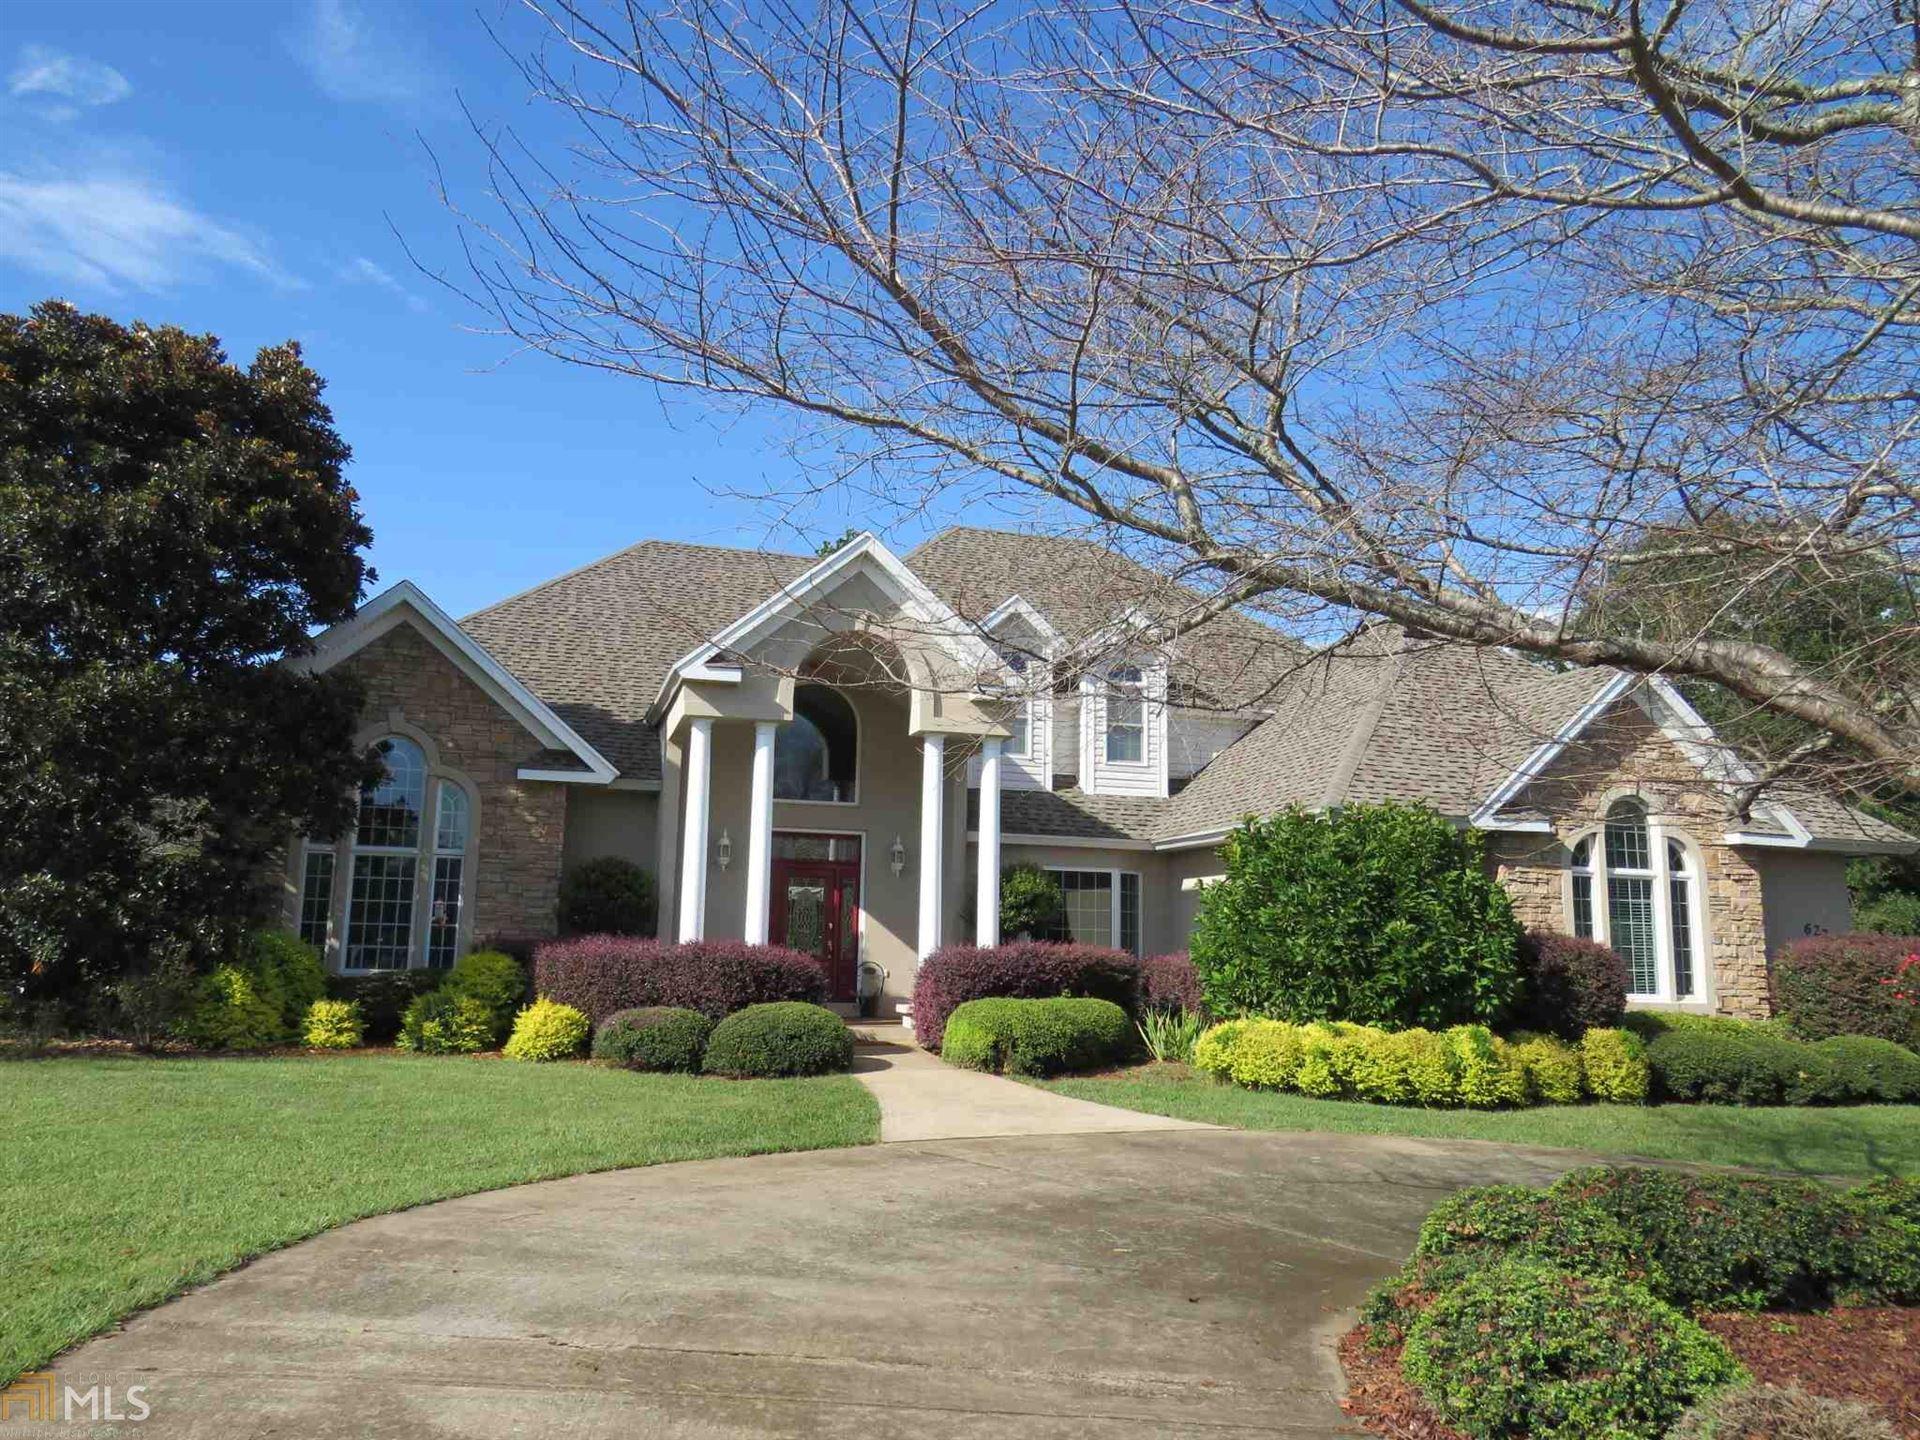 627 Rising Star Rd, Brooks, GA 30205 - MLS#: 8889577